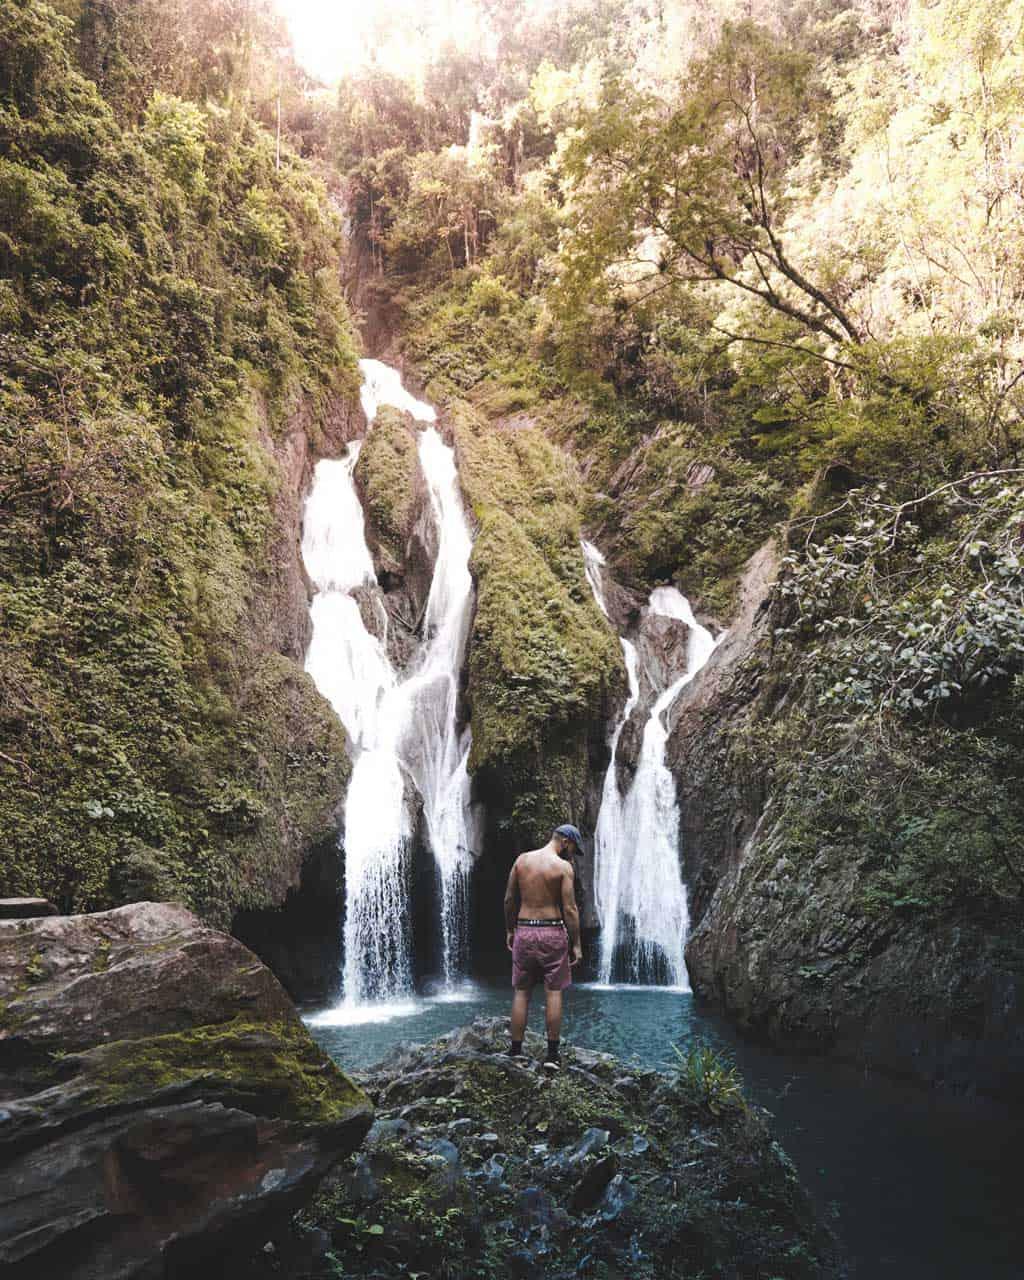 trinidad topes de collantes chutes eau cuba autrement 1